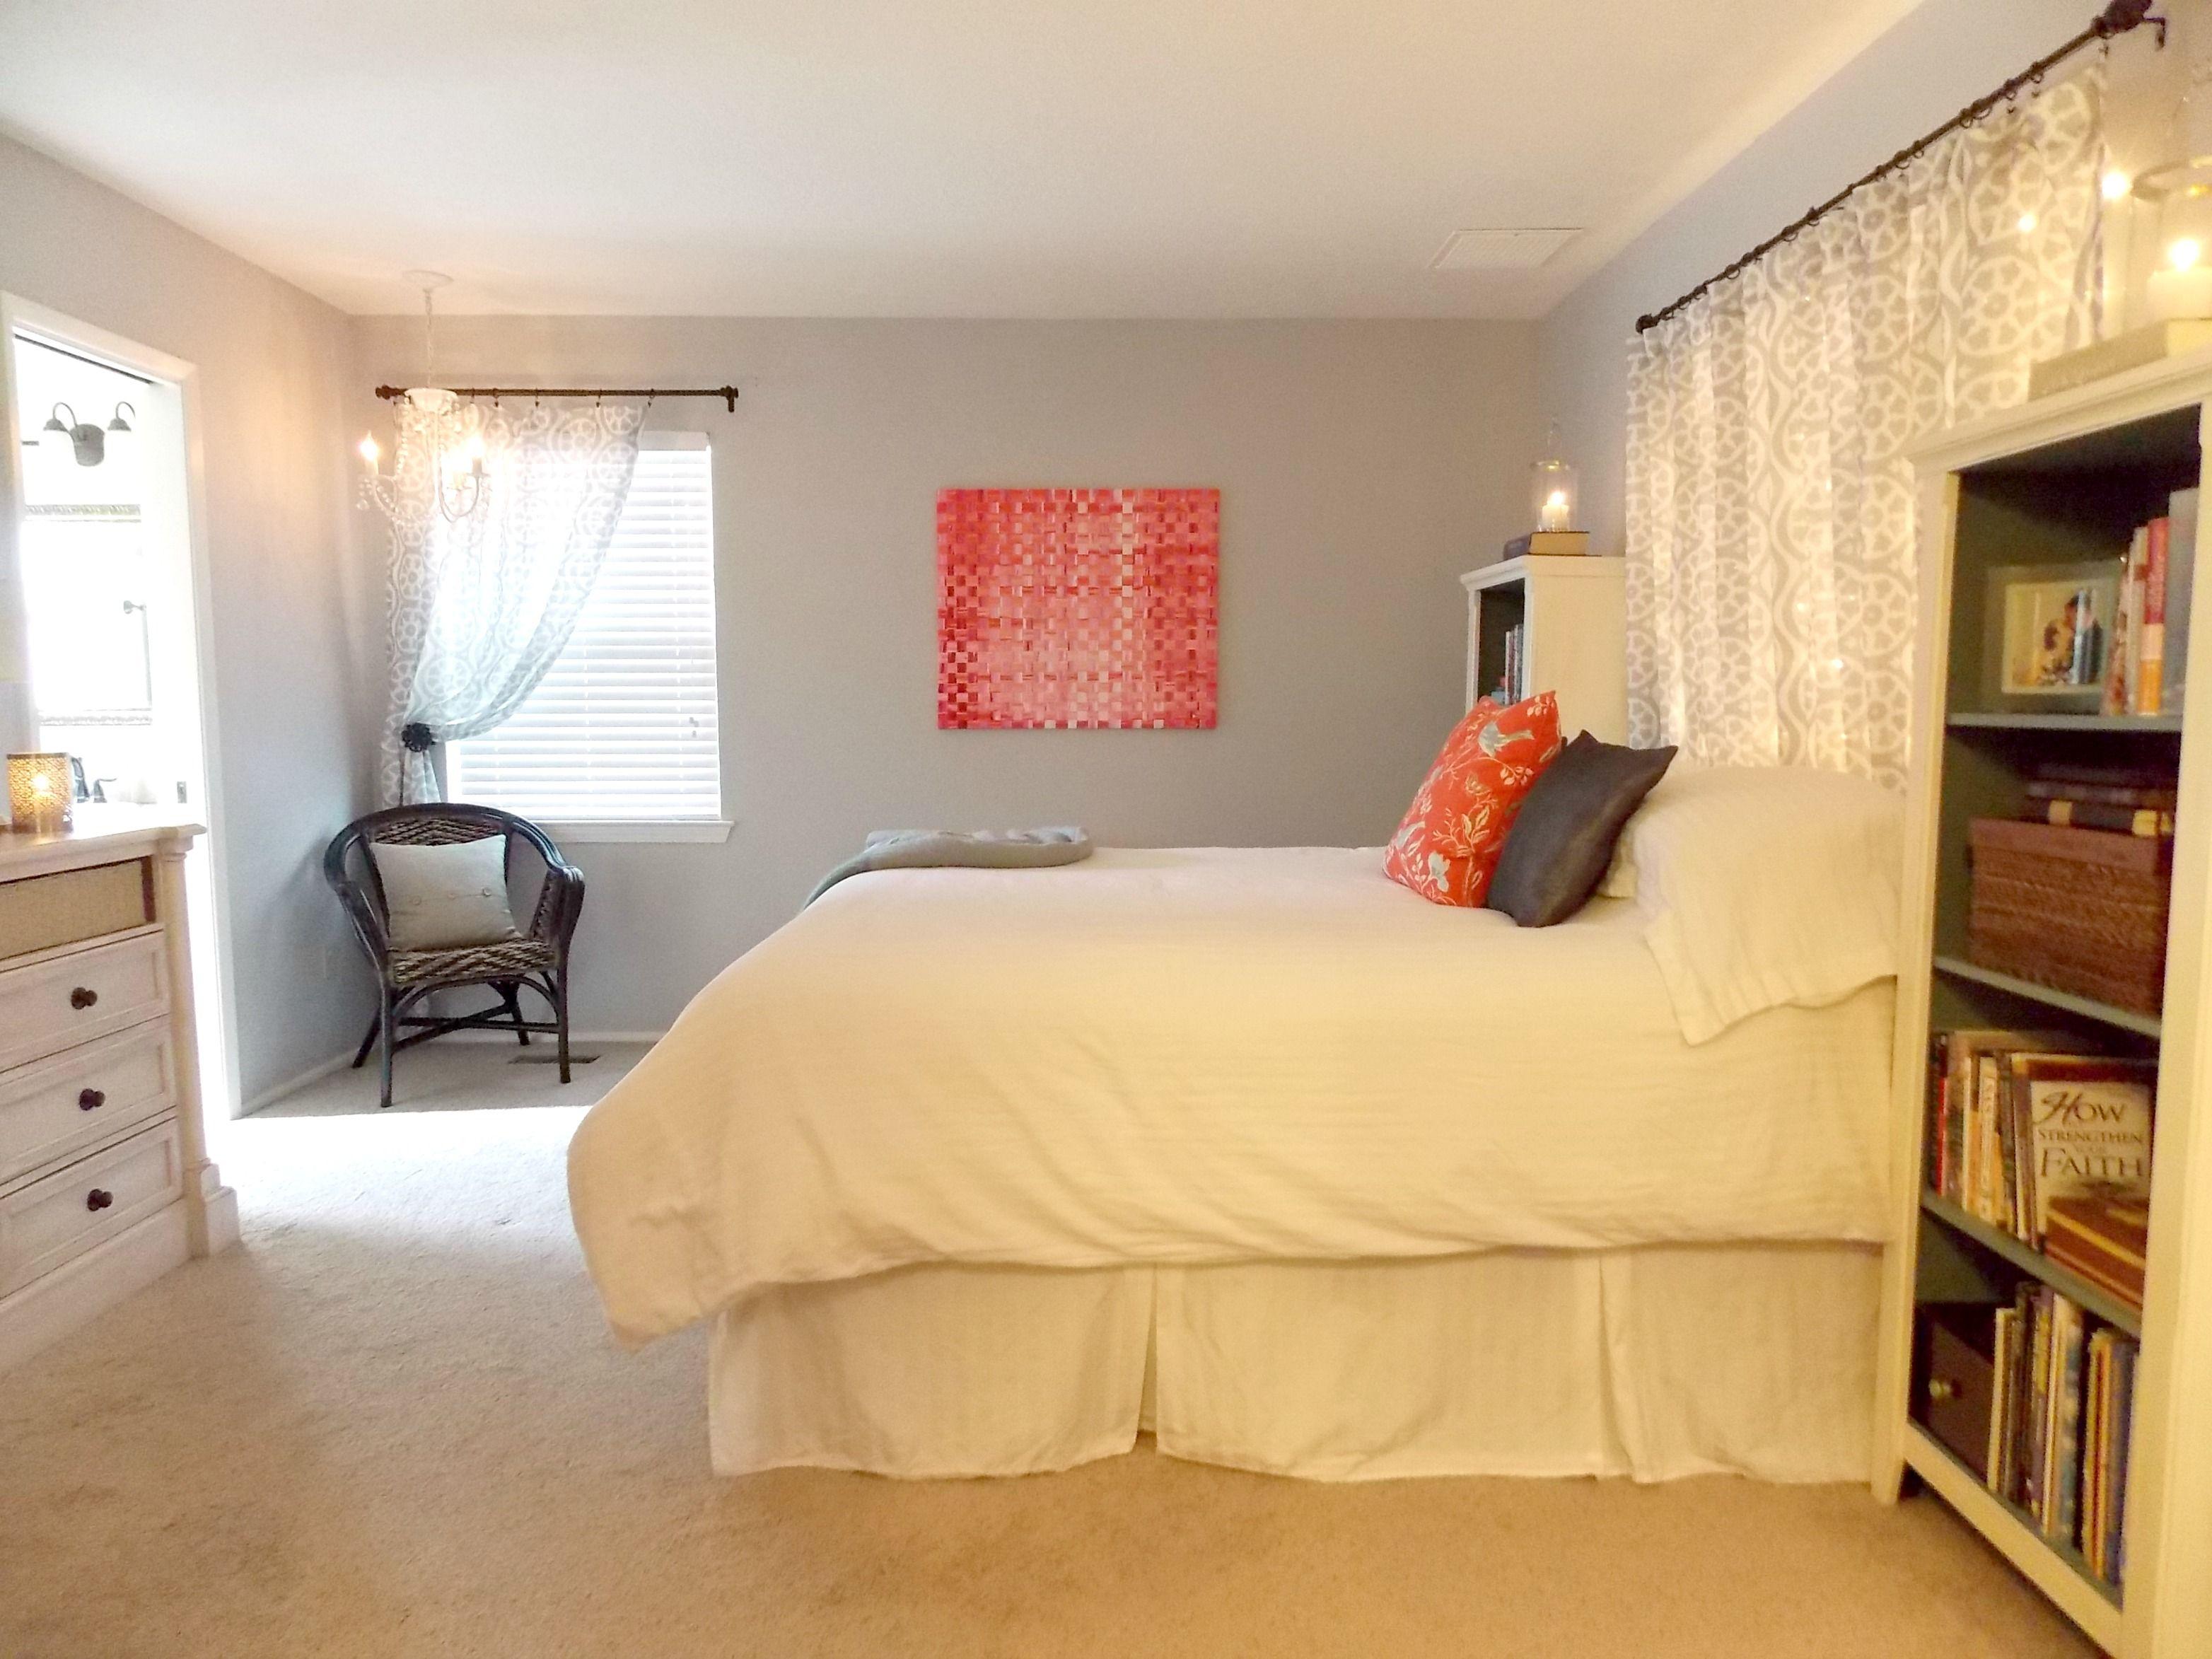 Master Bedroom Makeover on a Budget | Master bedroom ...